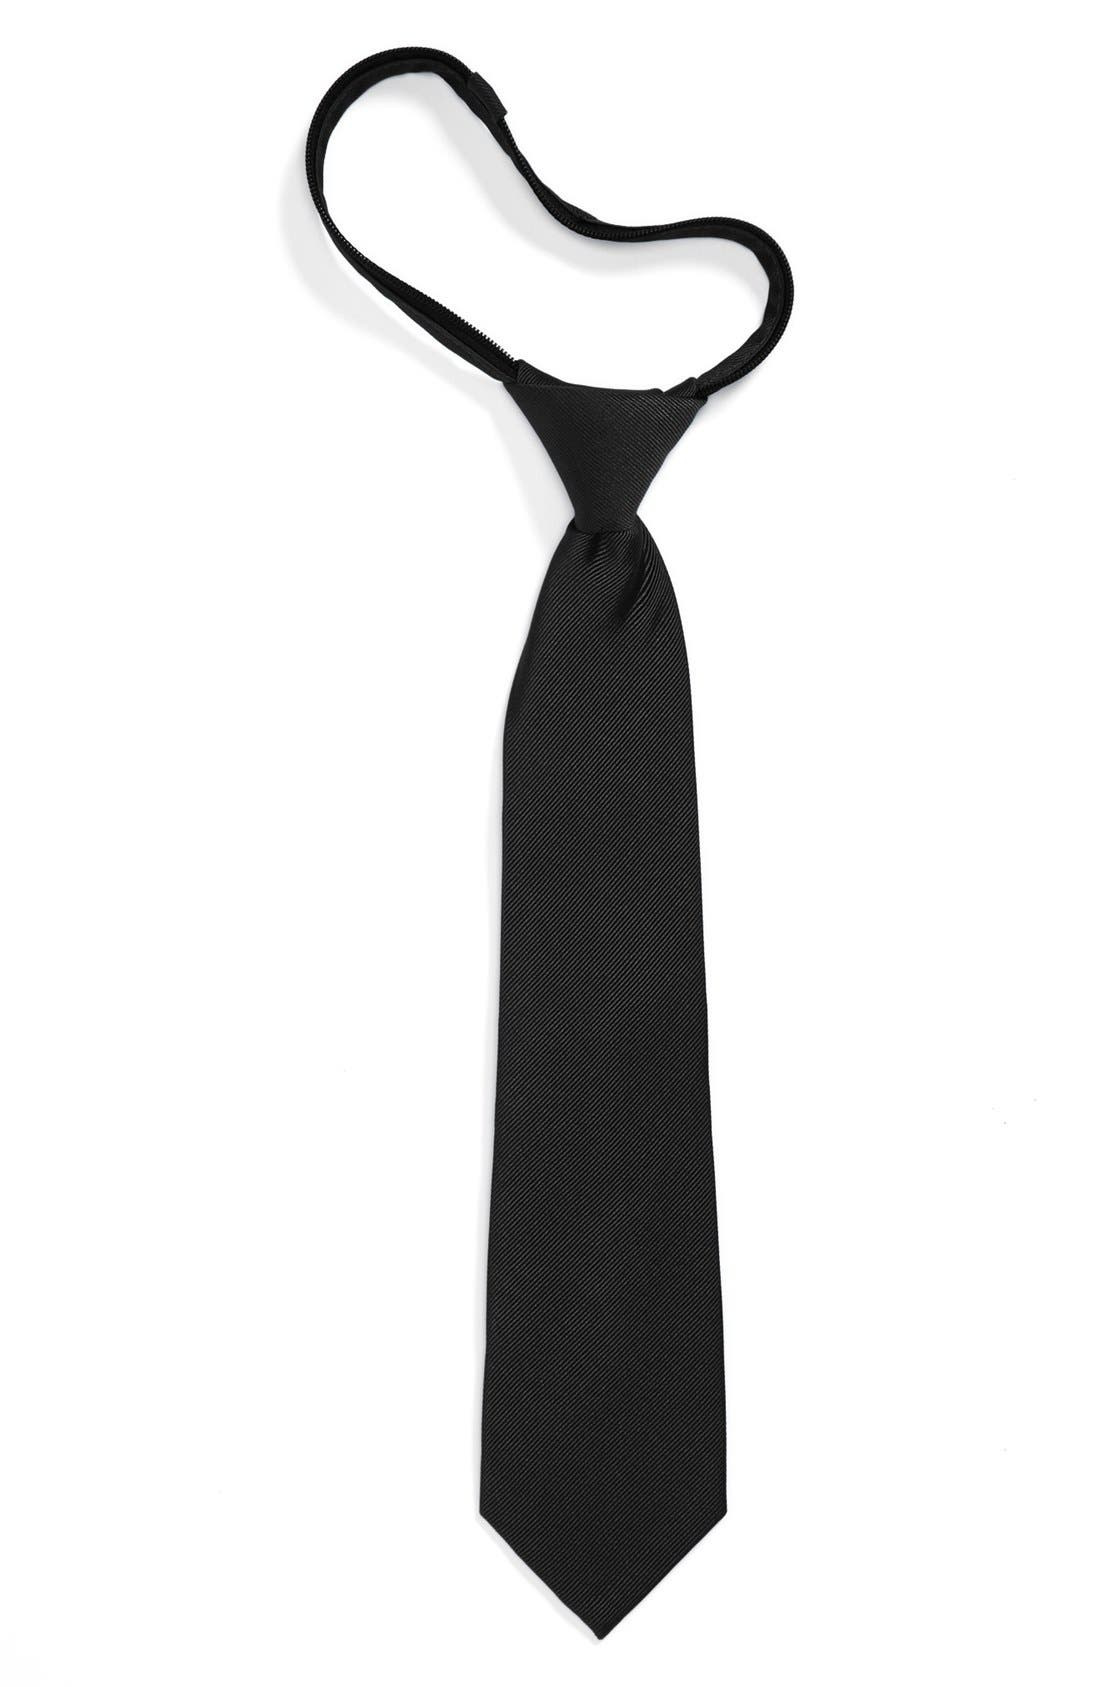 Alternate Image 1 Selected - Nordstrom Silk Zipper Tie (Little Boys & Big Boys)